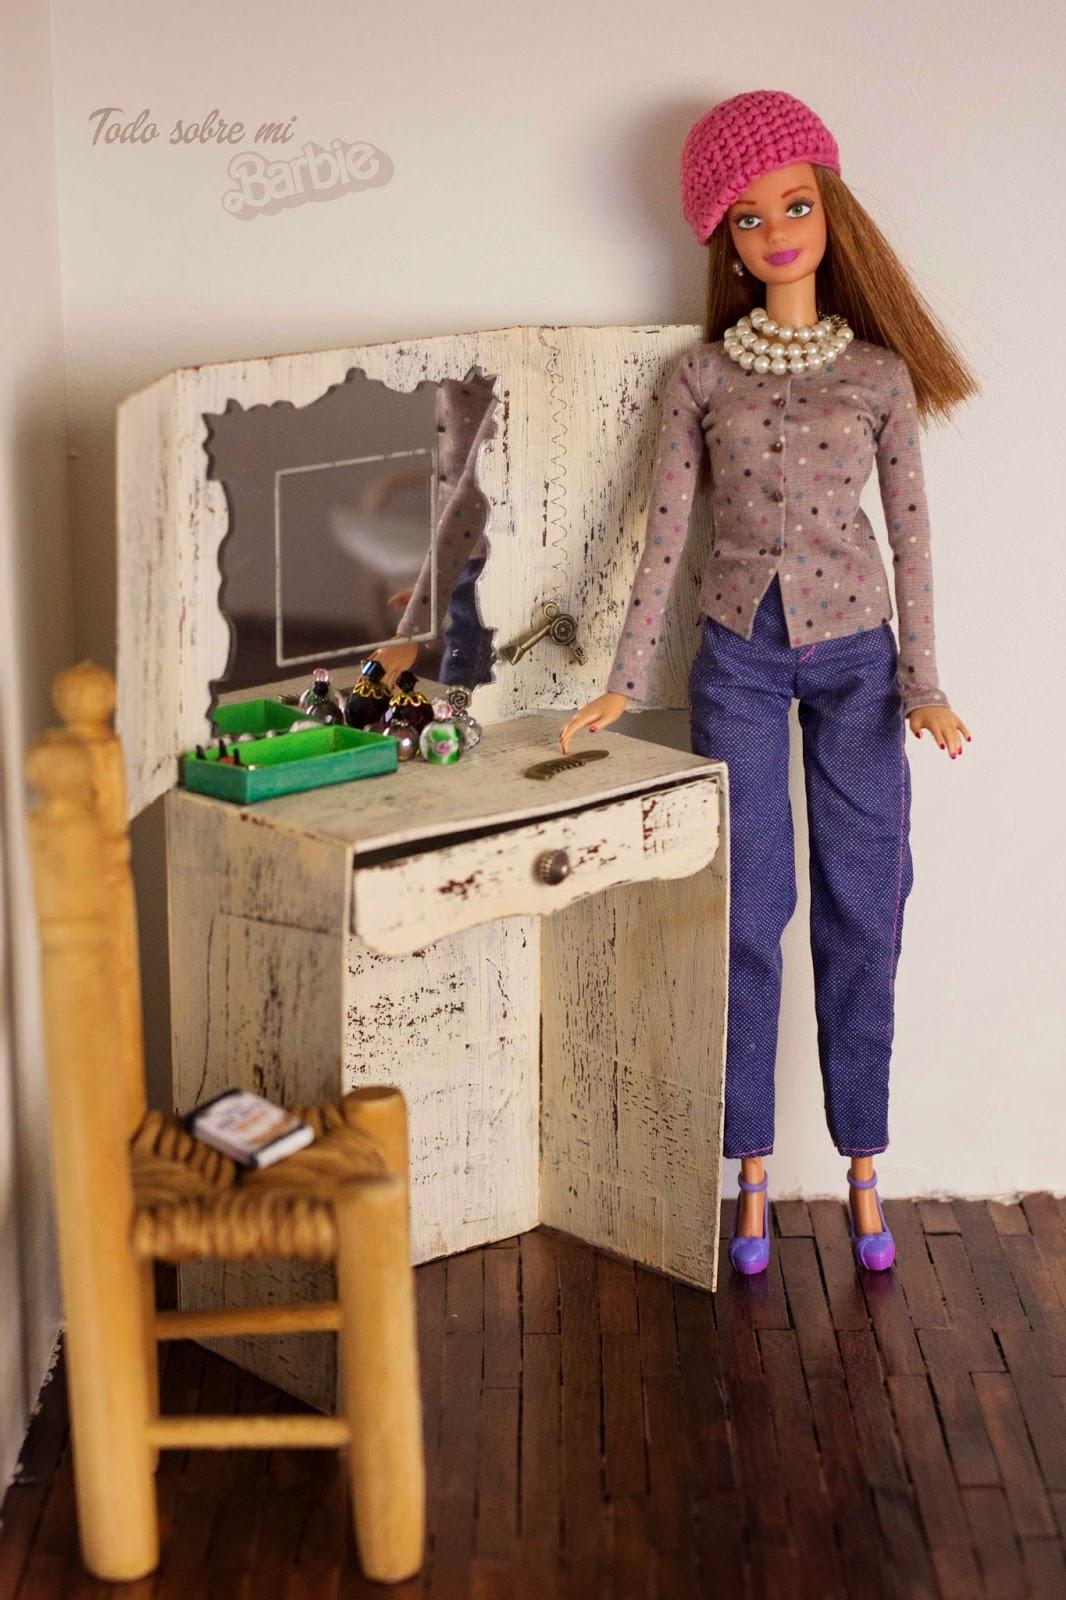 Todo sobre mi Barbie: Gorro de ganchillo, patrón para Barbie.